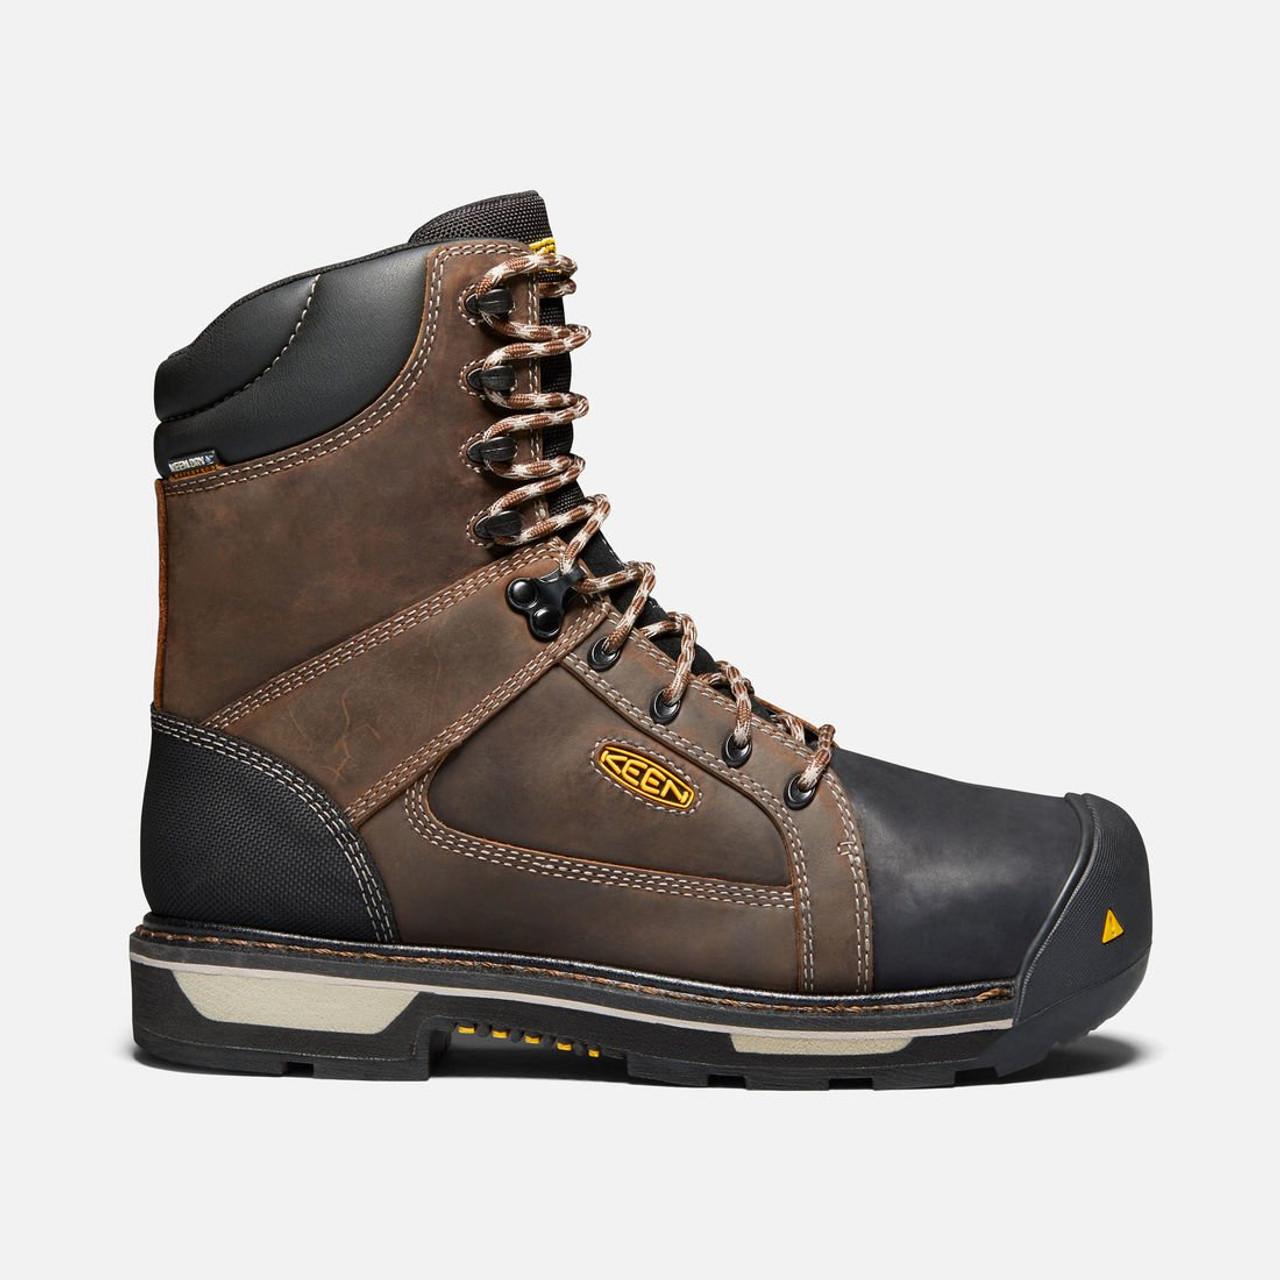 59aa3c233b9 Men's Keen CSA Oakland 400 Gram Waterproof Work Boot FREE SHIPPING